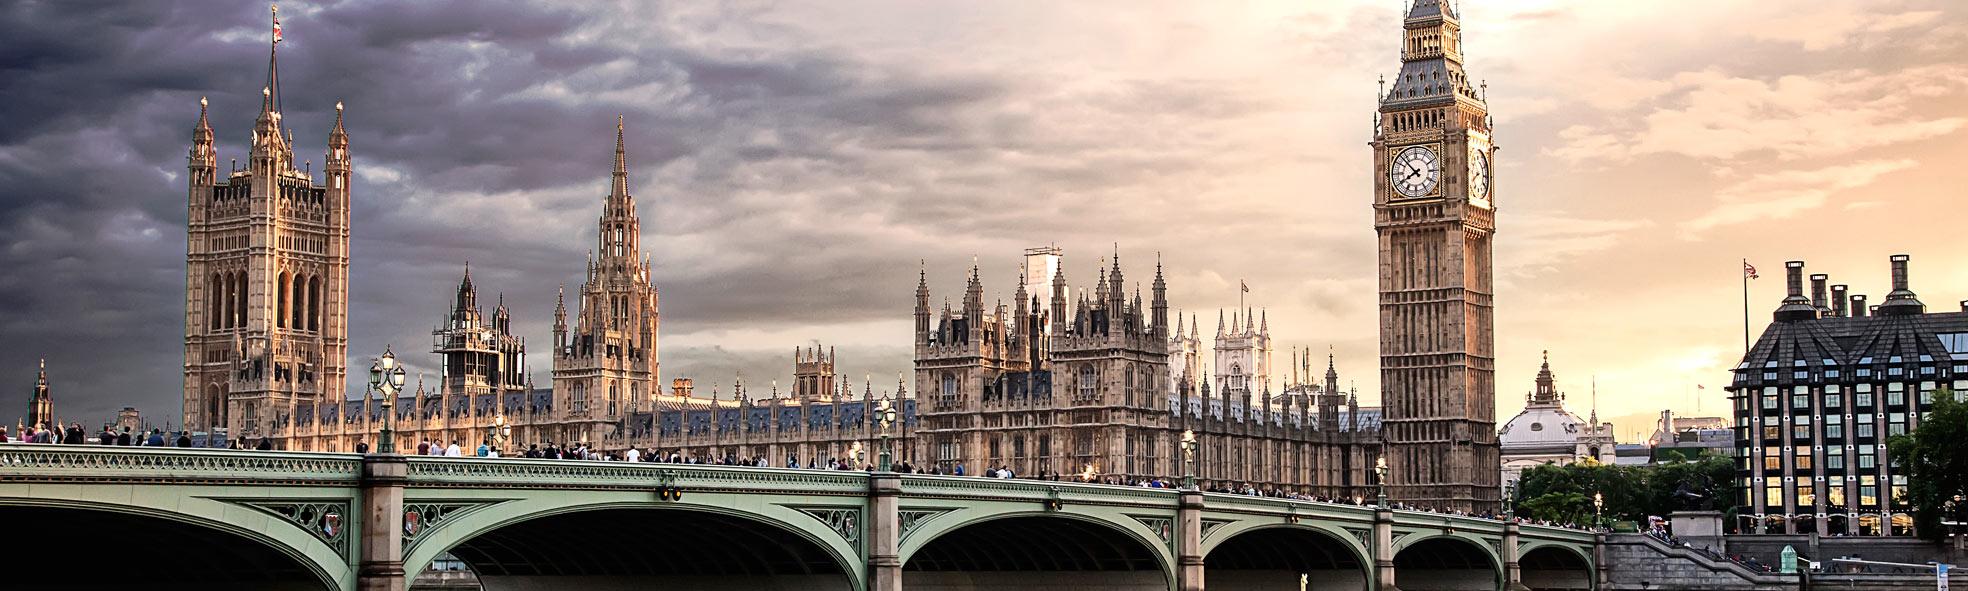 london_schmal